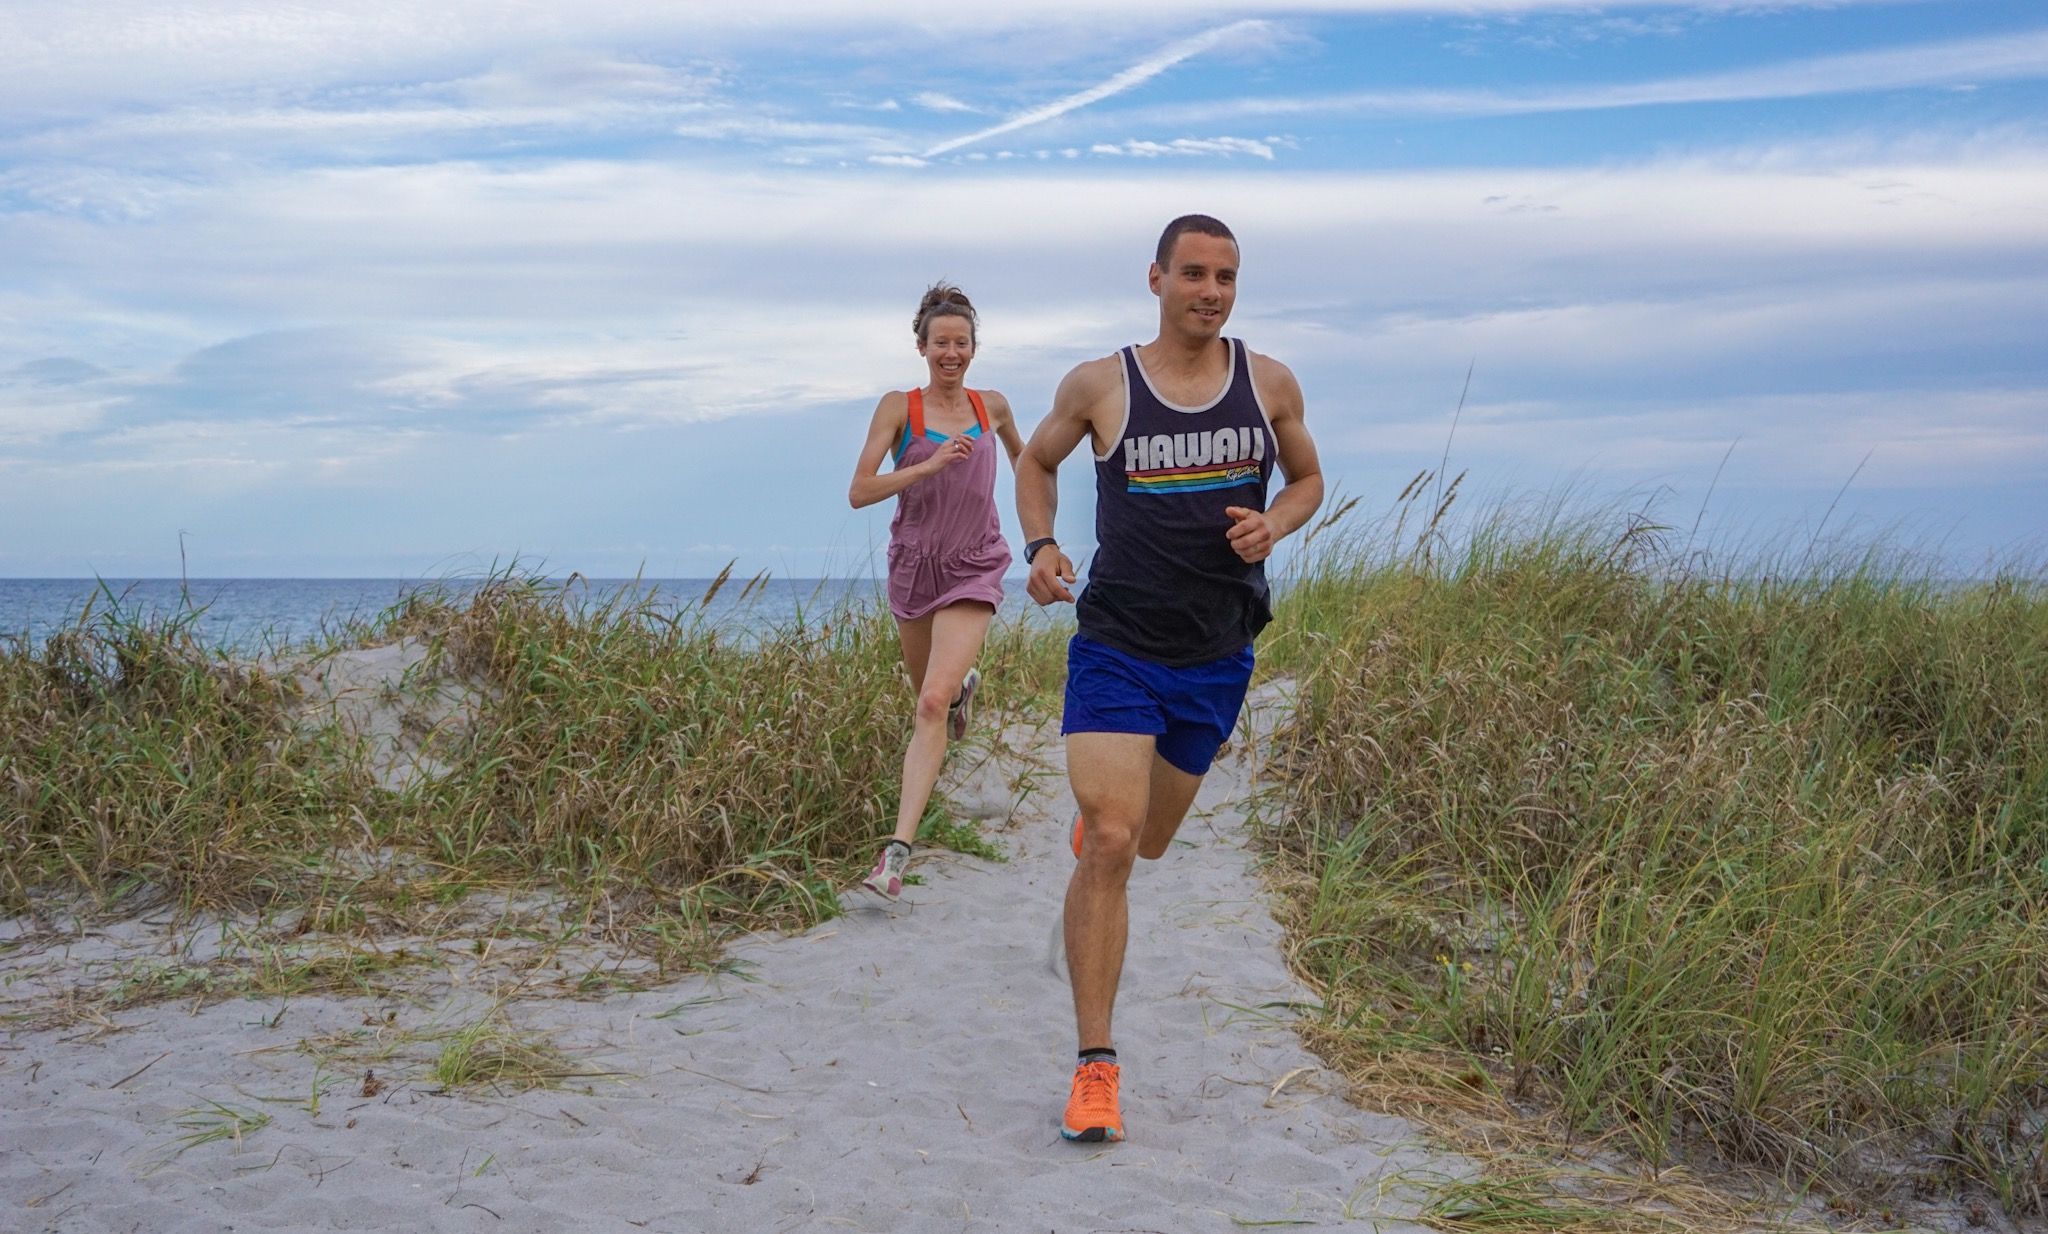 Running on Beach-Plant Positive Running-Florida May 2018-WEB.jpg